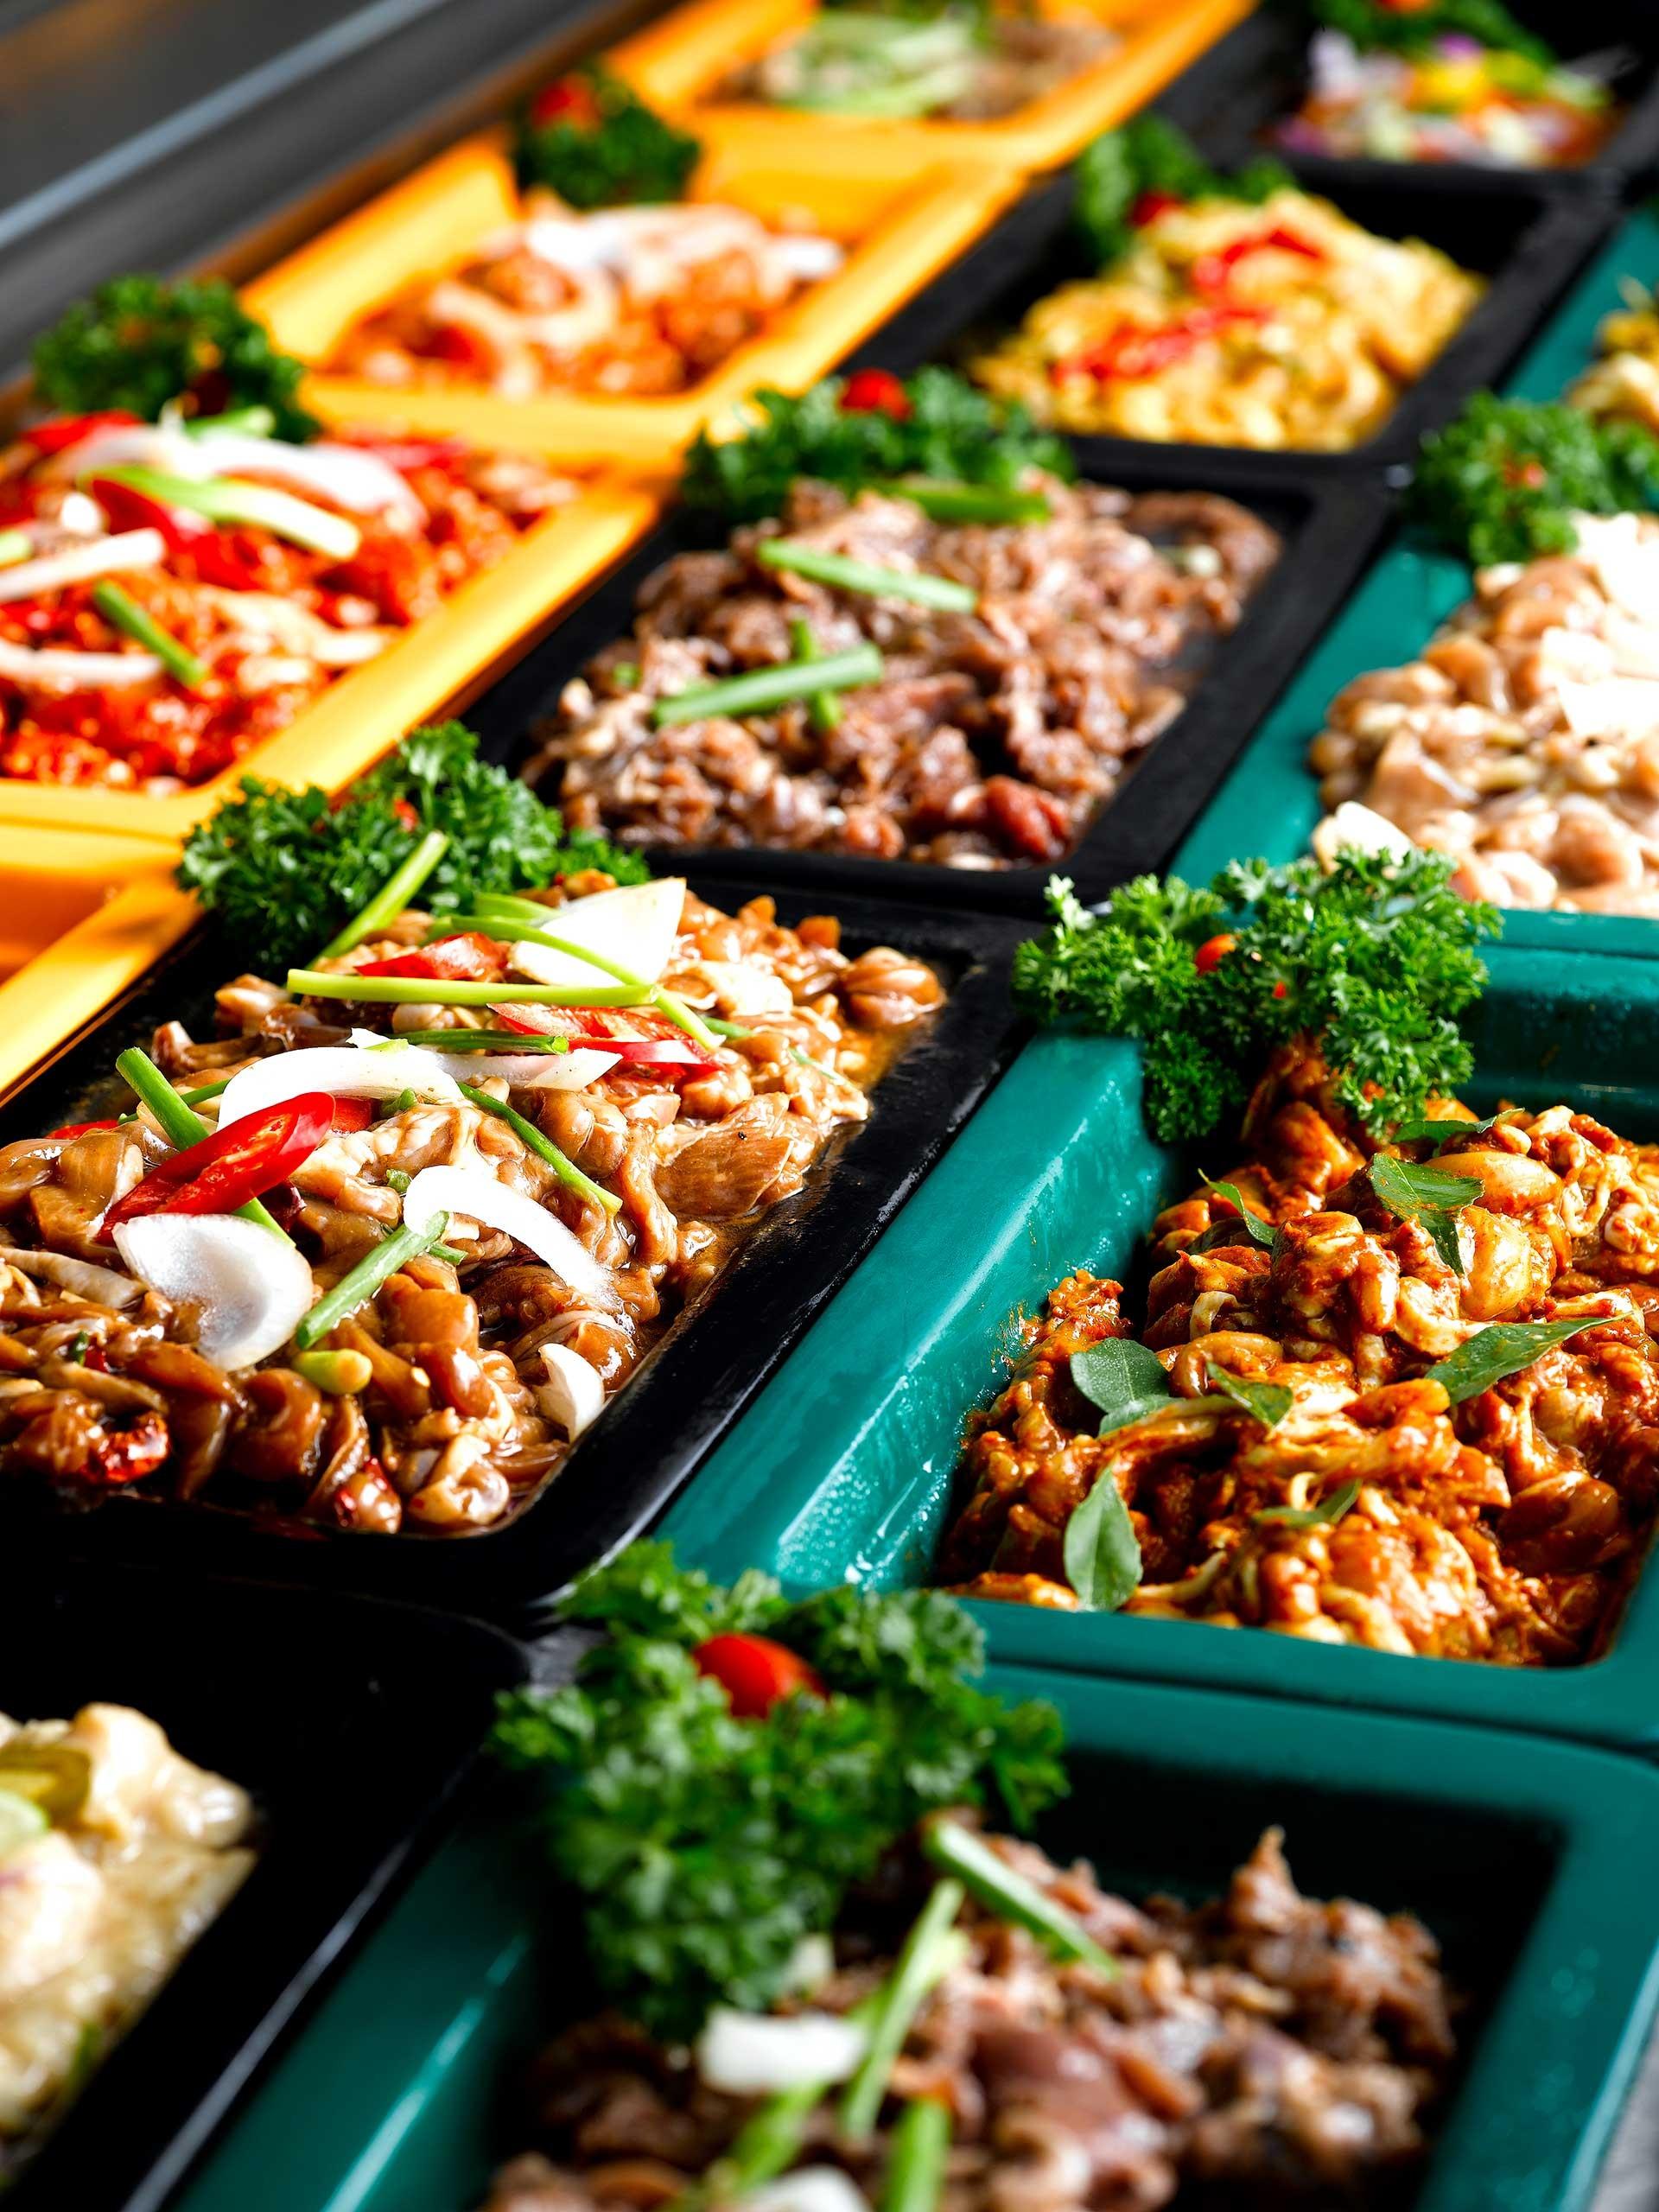 Seoul Garden Halal Buffet Singapore